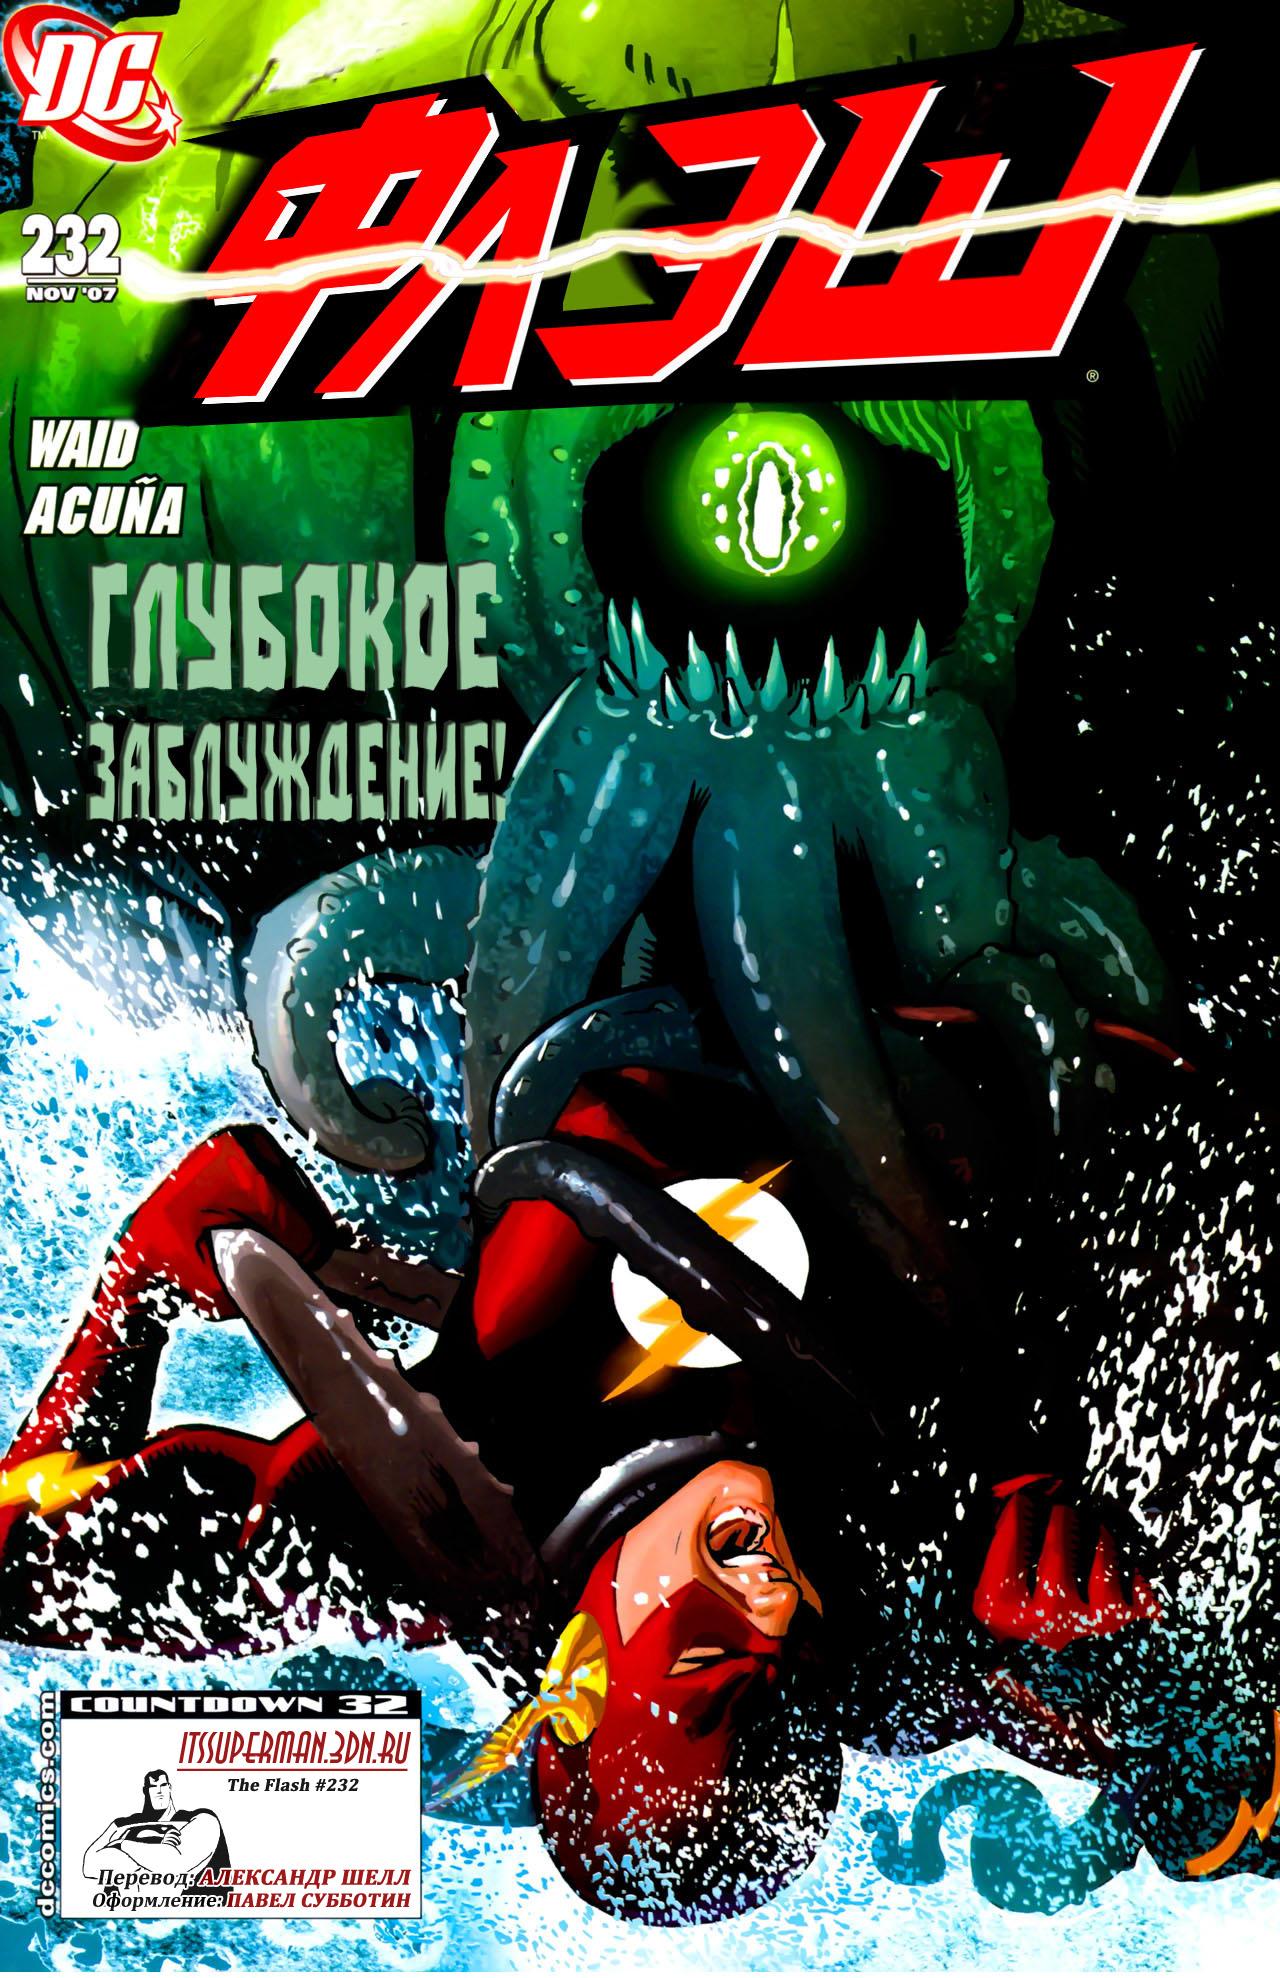 Комиксы Онлайн - Флеш том 2 - # 232 - Страница №1 - Flash vol 2 - # 232